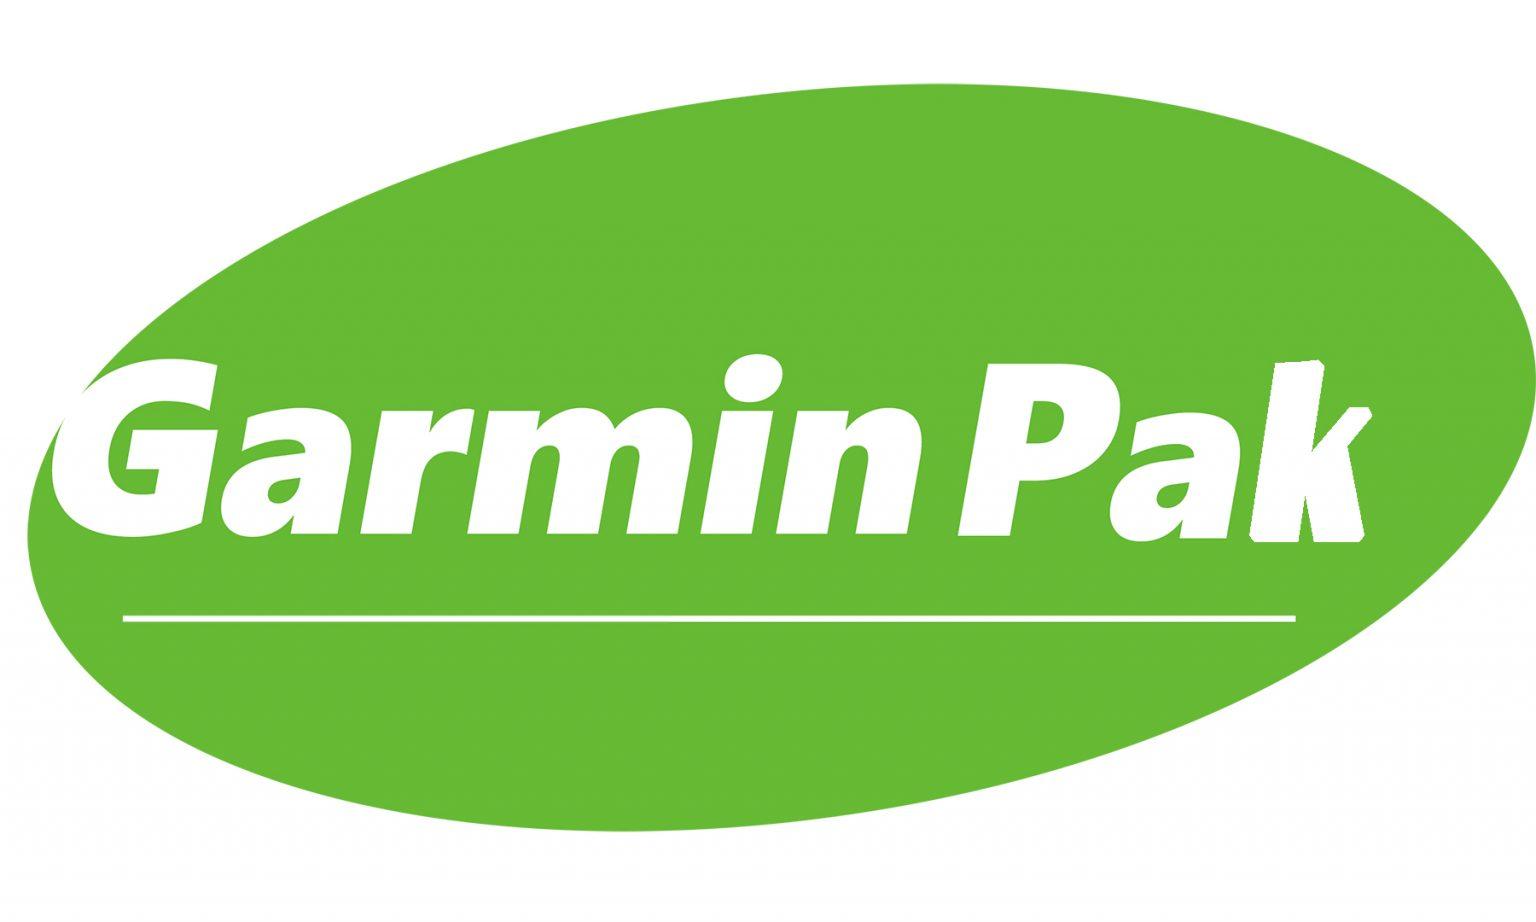 Garmin pack 1800px